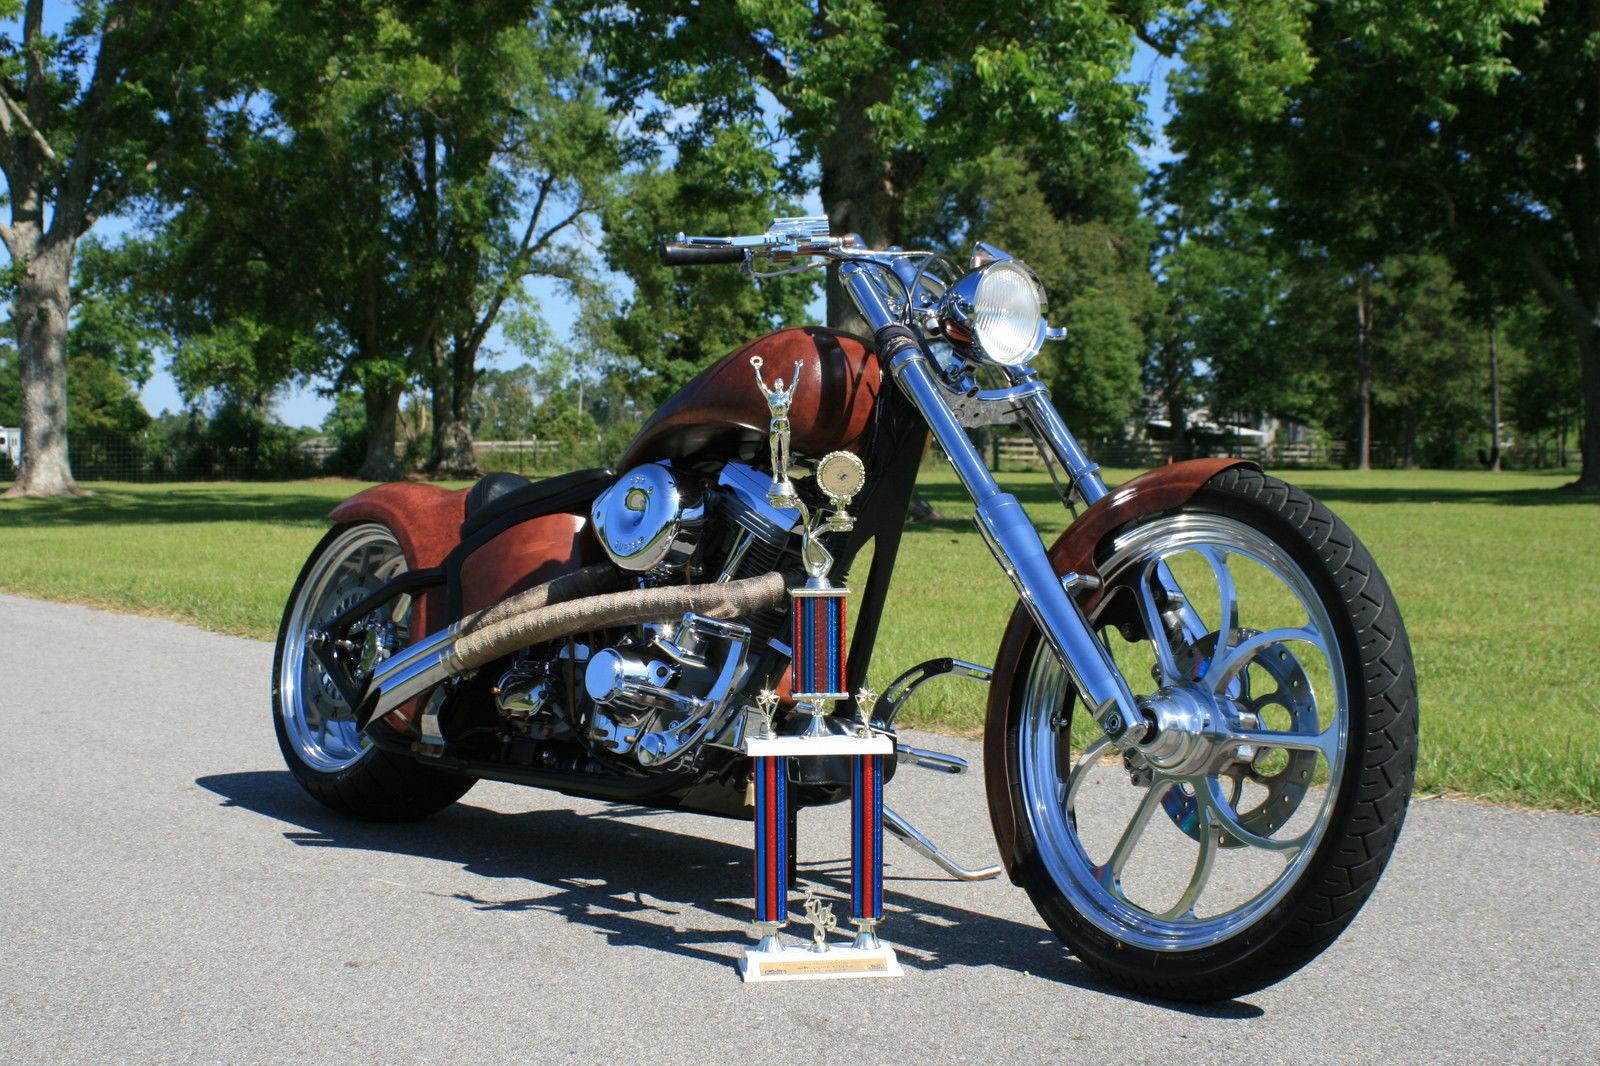 Harley Davidson Titled Custom Built Chopper Motorcycle